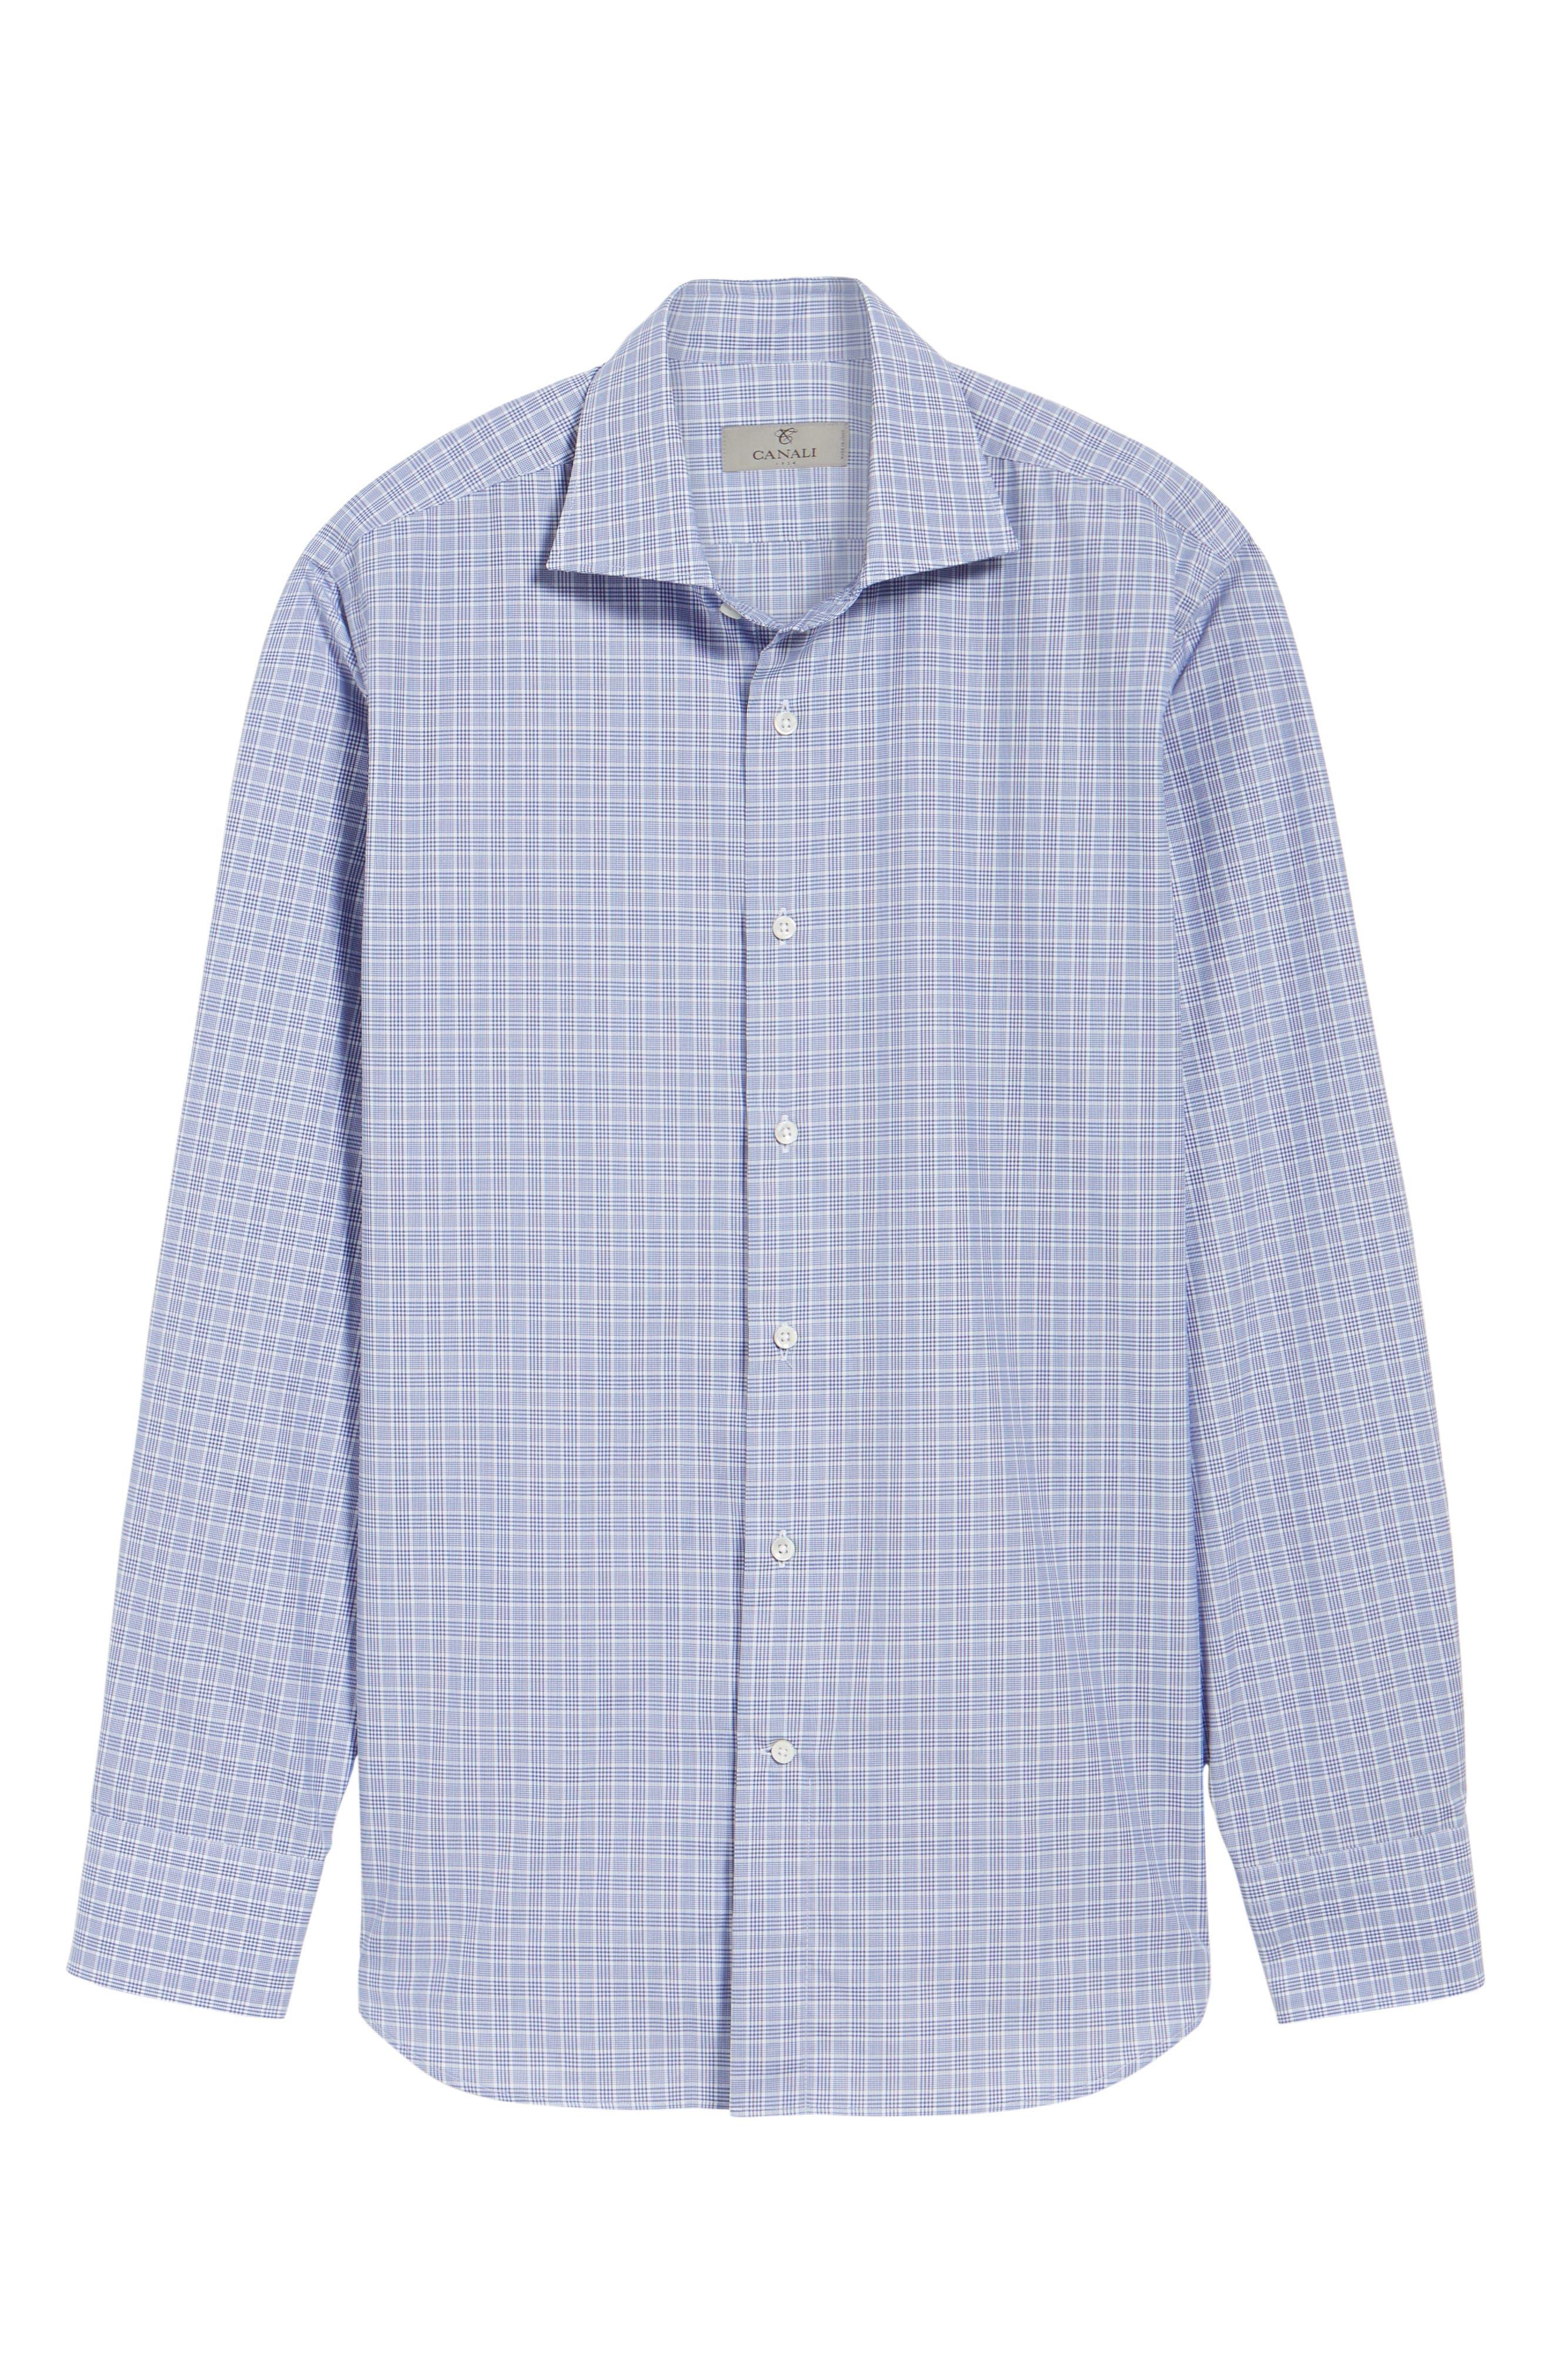 Alternate Image 5  - Canali Regular Fit Plaid Dress Shirt